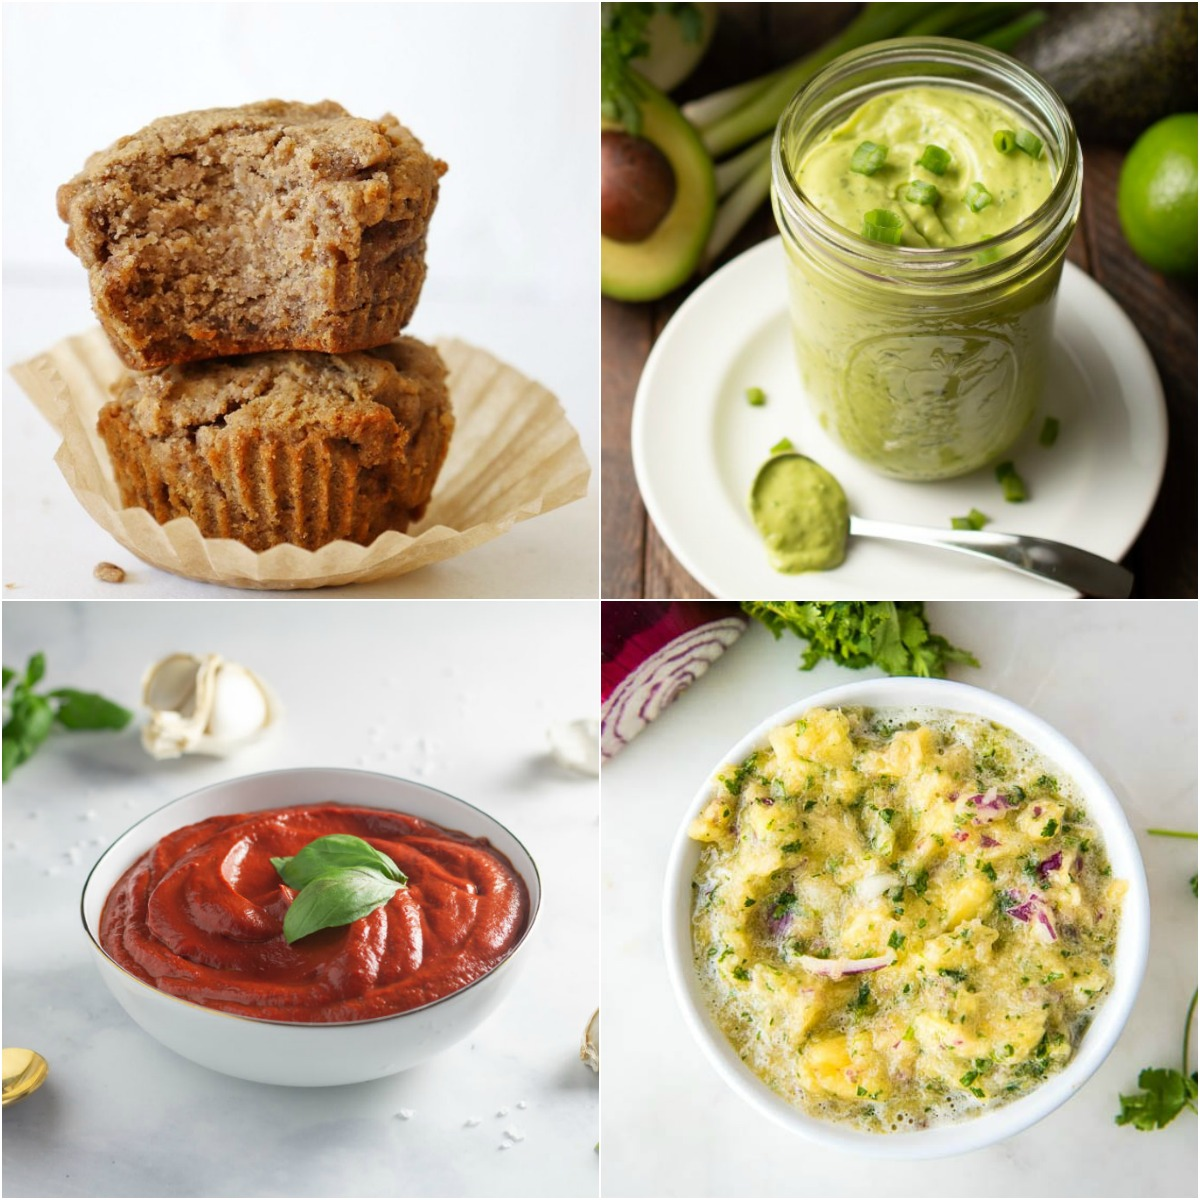 Paleo AIP Recipe Roundtable #326 | Phoenix Helix - *Featured Recipes: Banana Spice Muffins, Marinara Sauce, Avocado Cilantro Dressing/Dip, and 3-Minute Pineapple Salsa